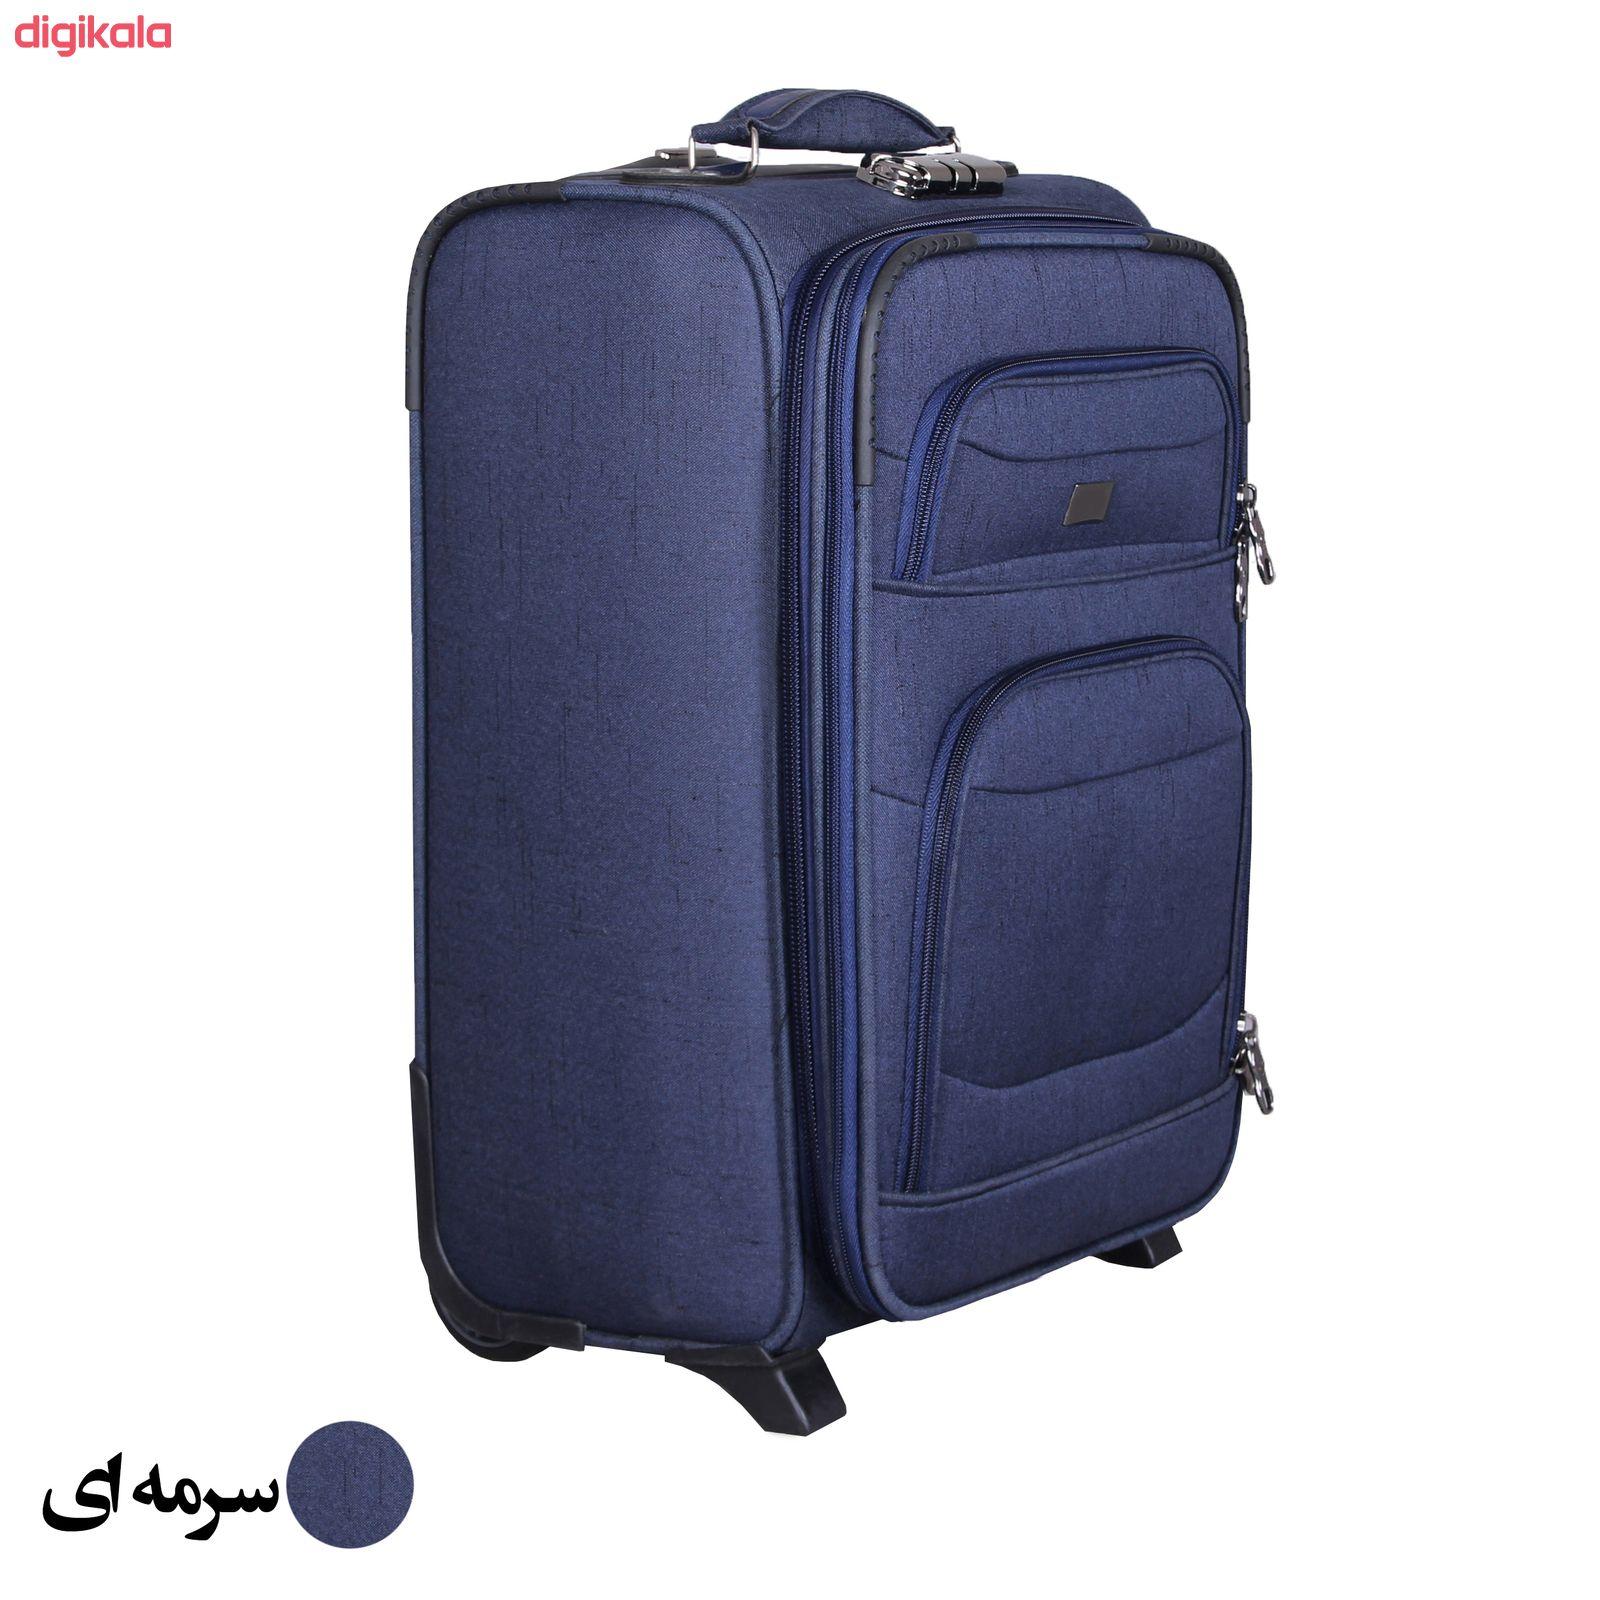 مجموعه سه عددی چمدان کد 2301A main 1 3